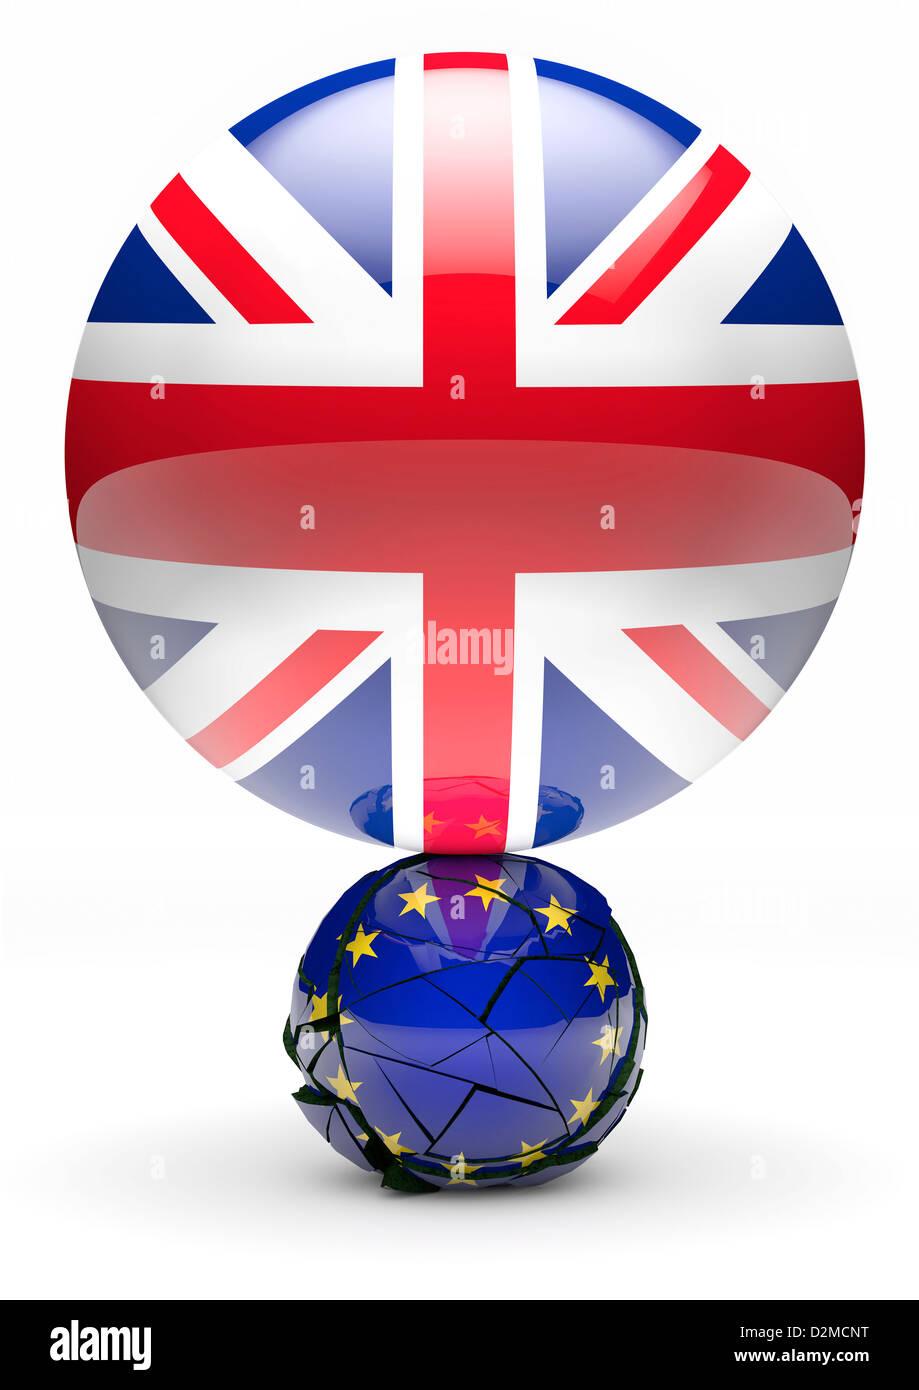 EU-Referendum-Konzept - Kugel Anschluß-Markierungsfahne vernichtende kleinere europäische Flagge Kugel Stockbild